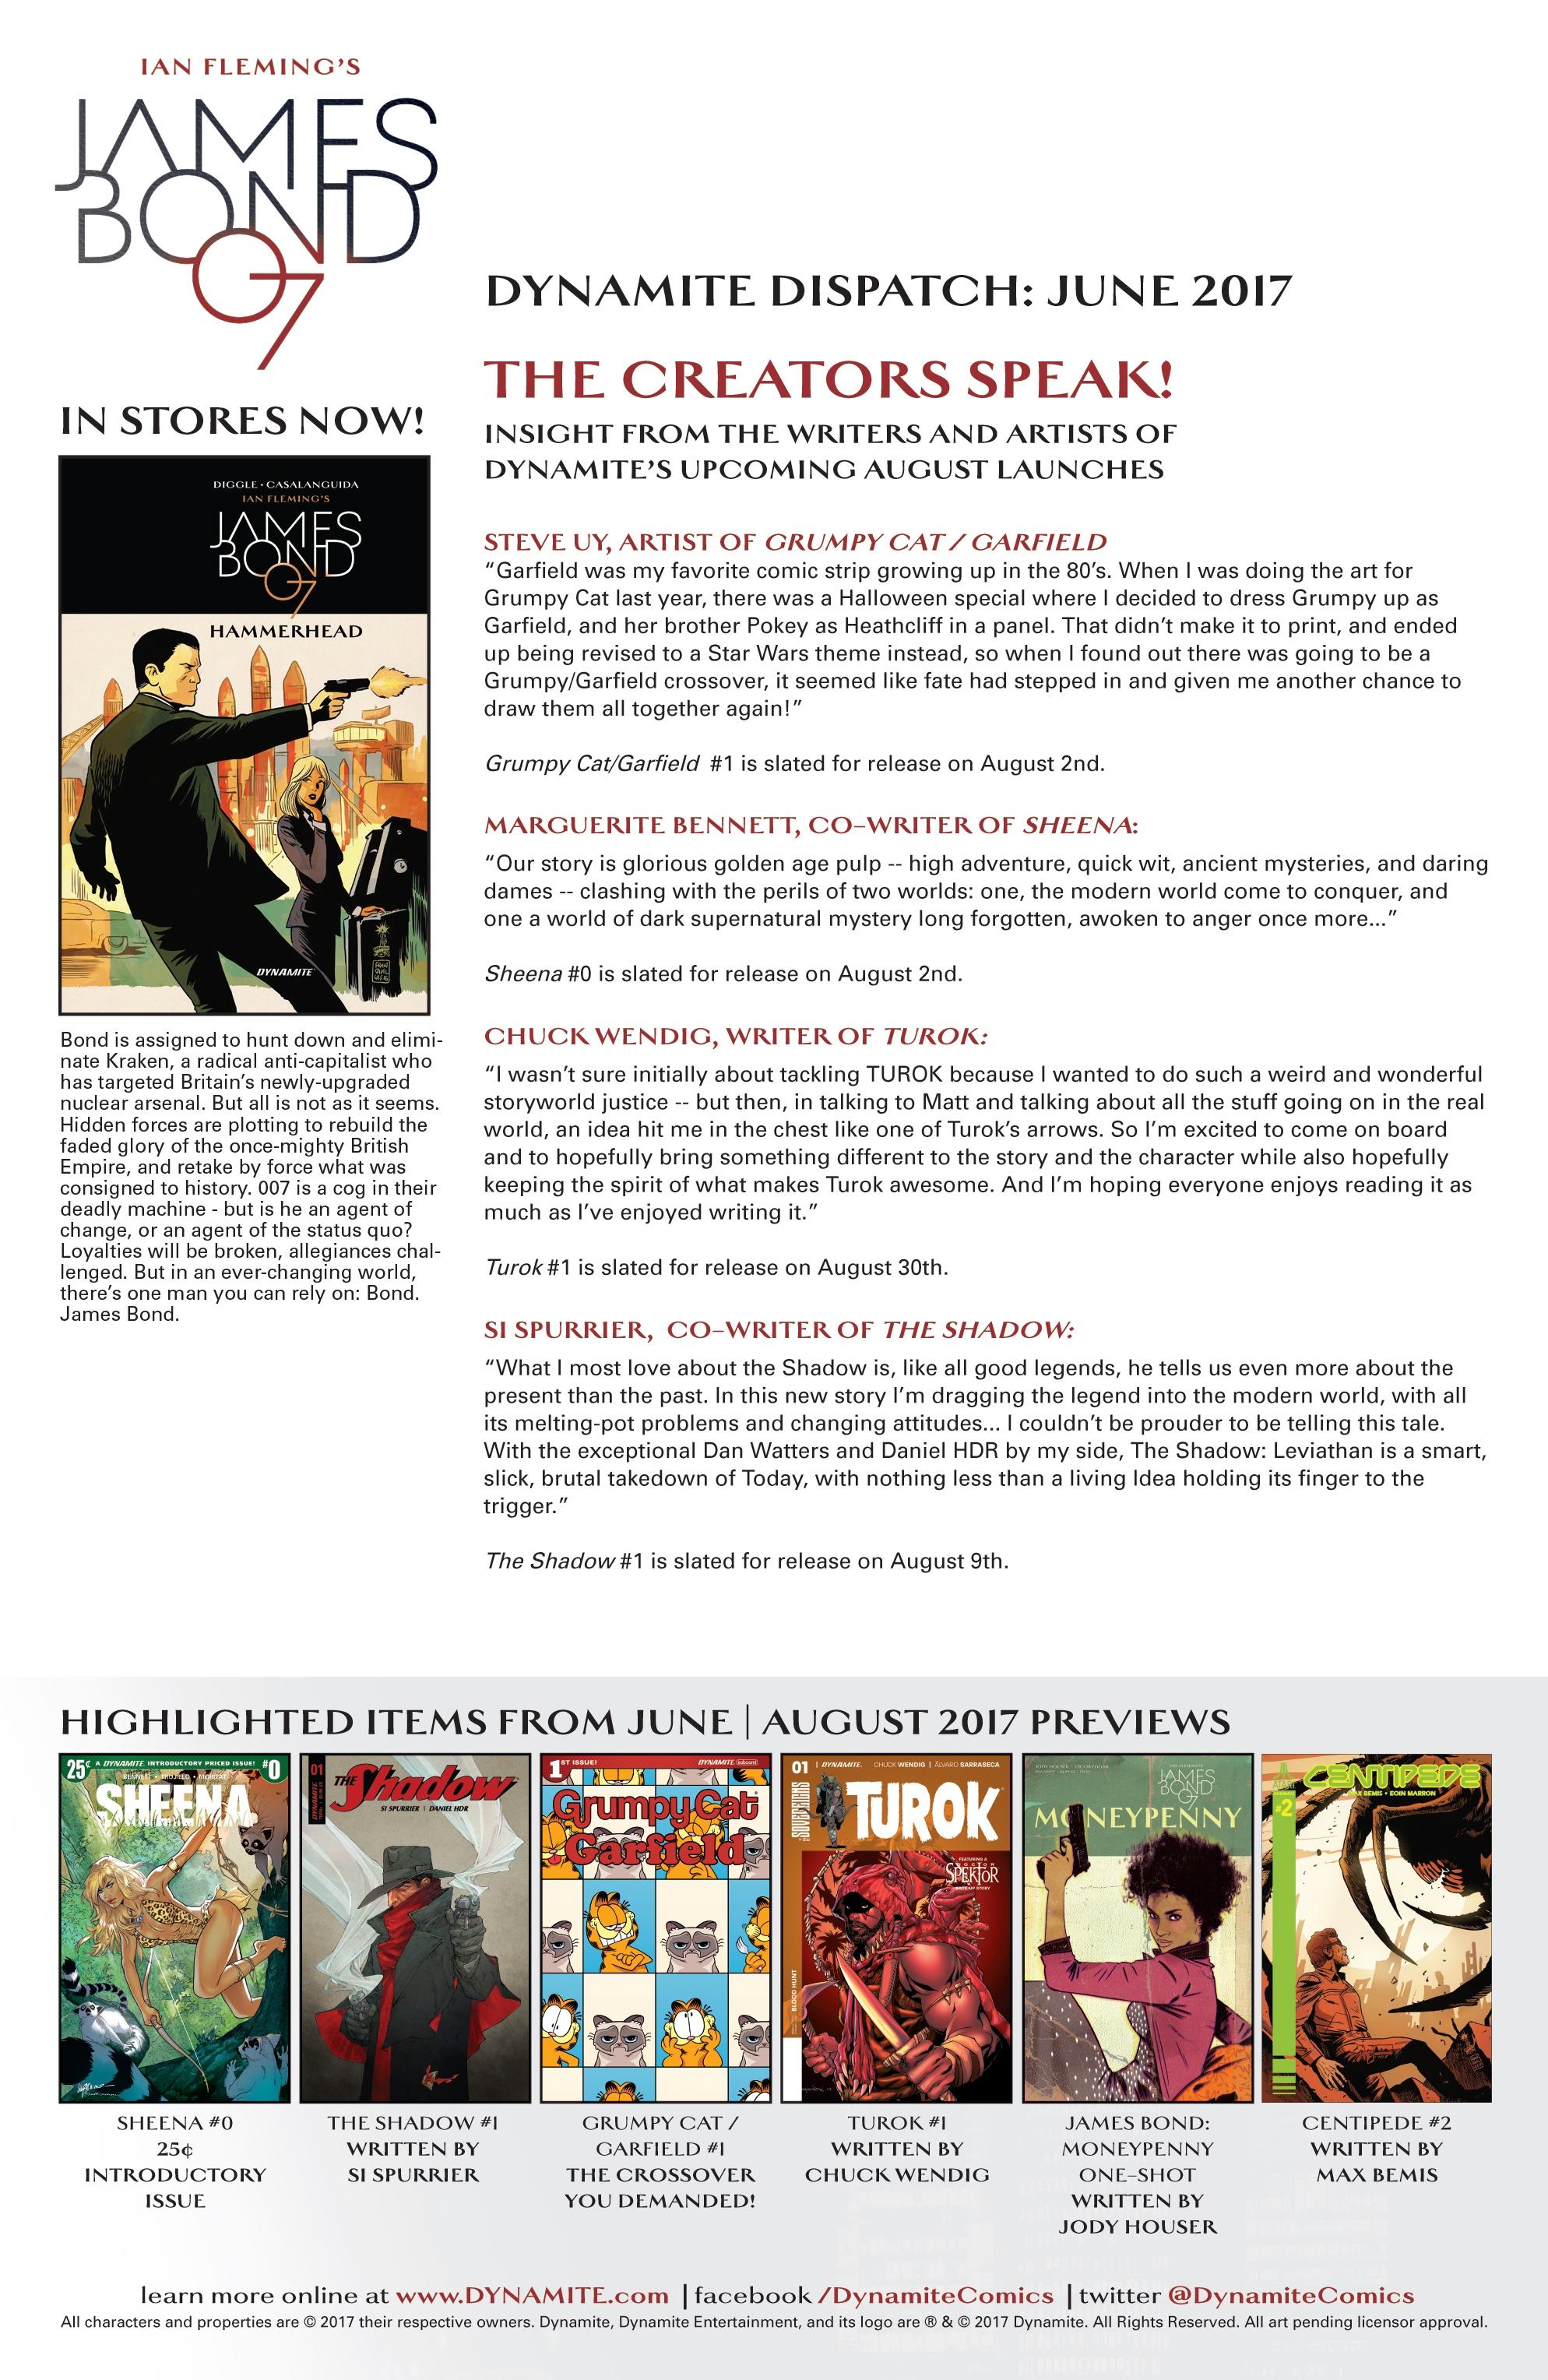 Read online James Bond: Felix Leiter comic -  Issue #6 - 23